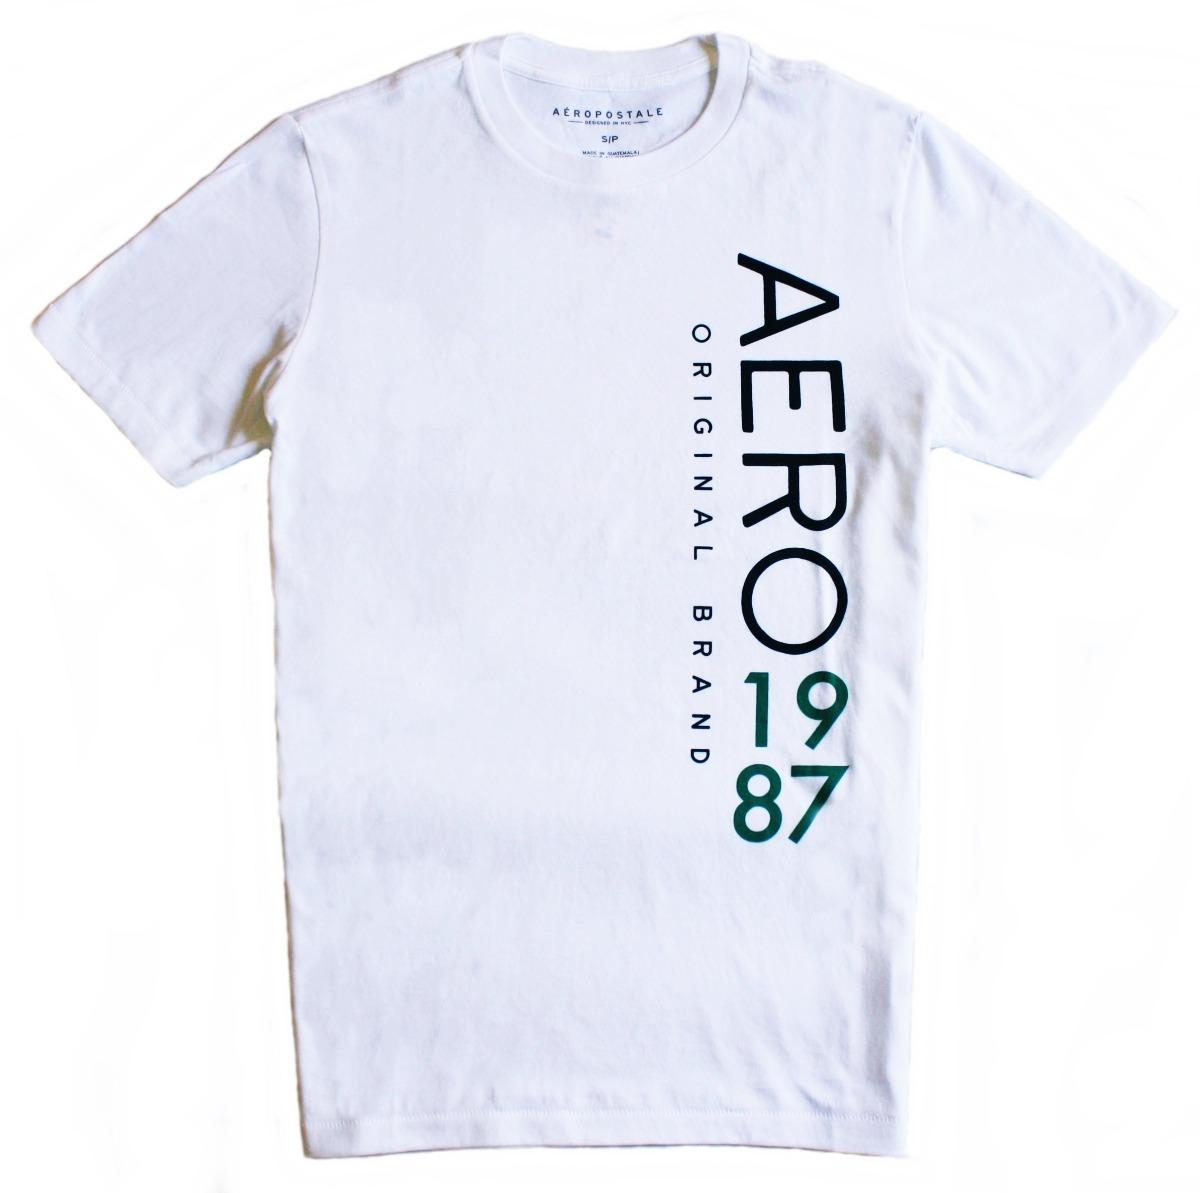 b5b8619c5c8d1 camiseta aeropostale original importada dos estados unidos. Carregando zoom.